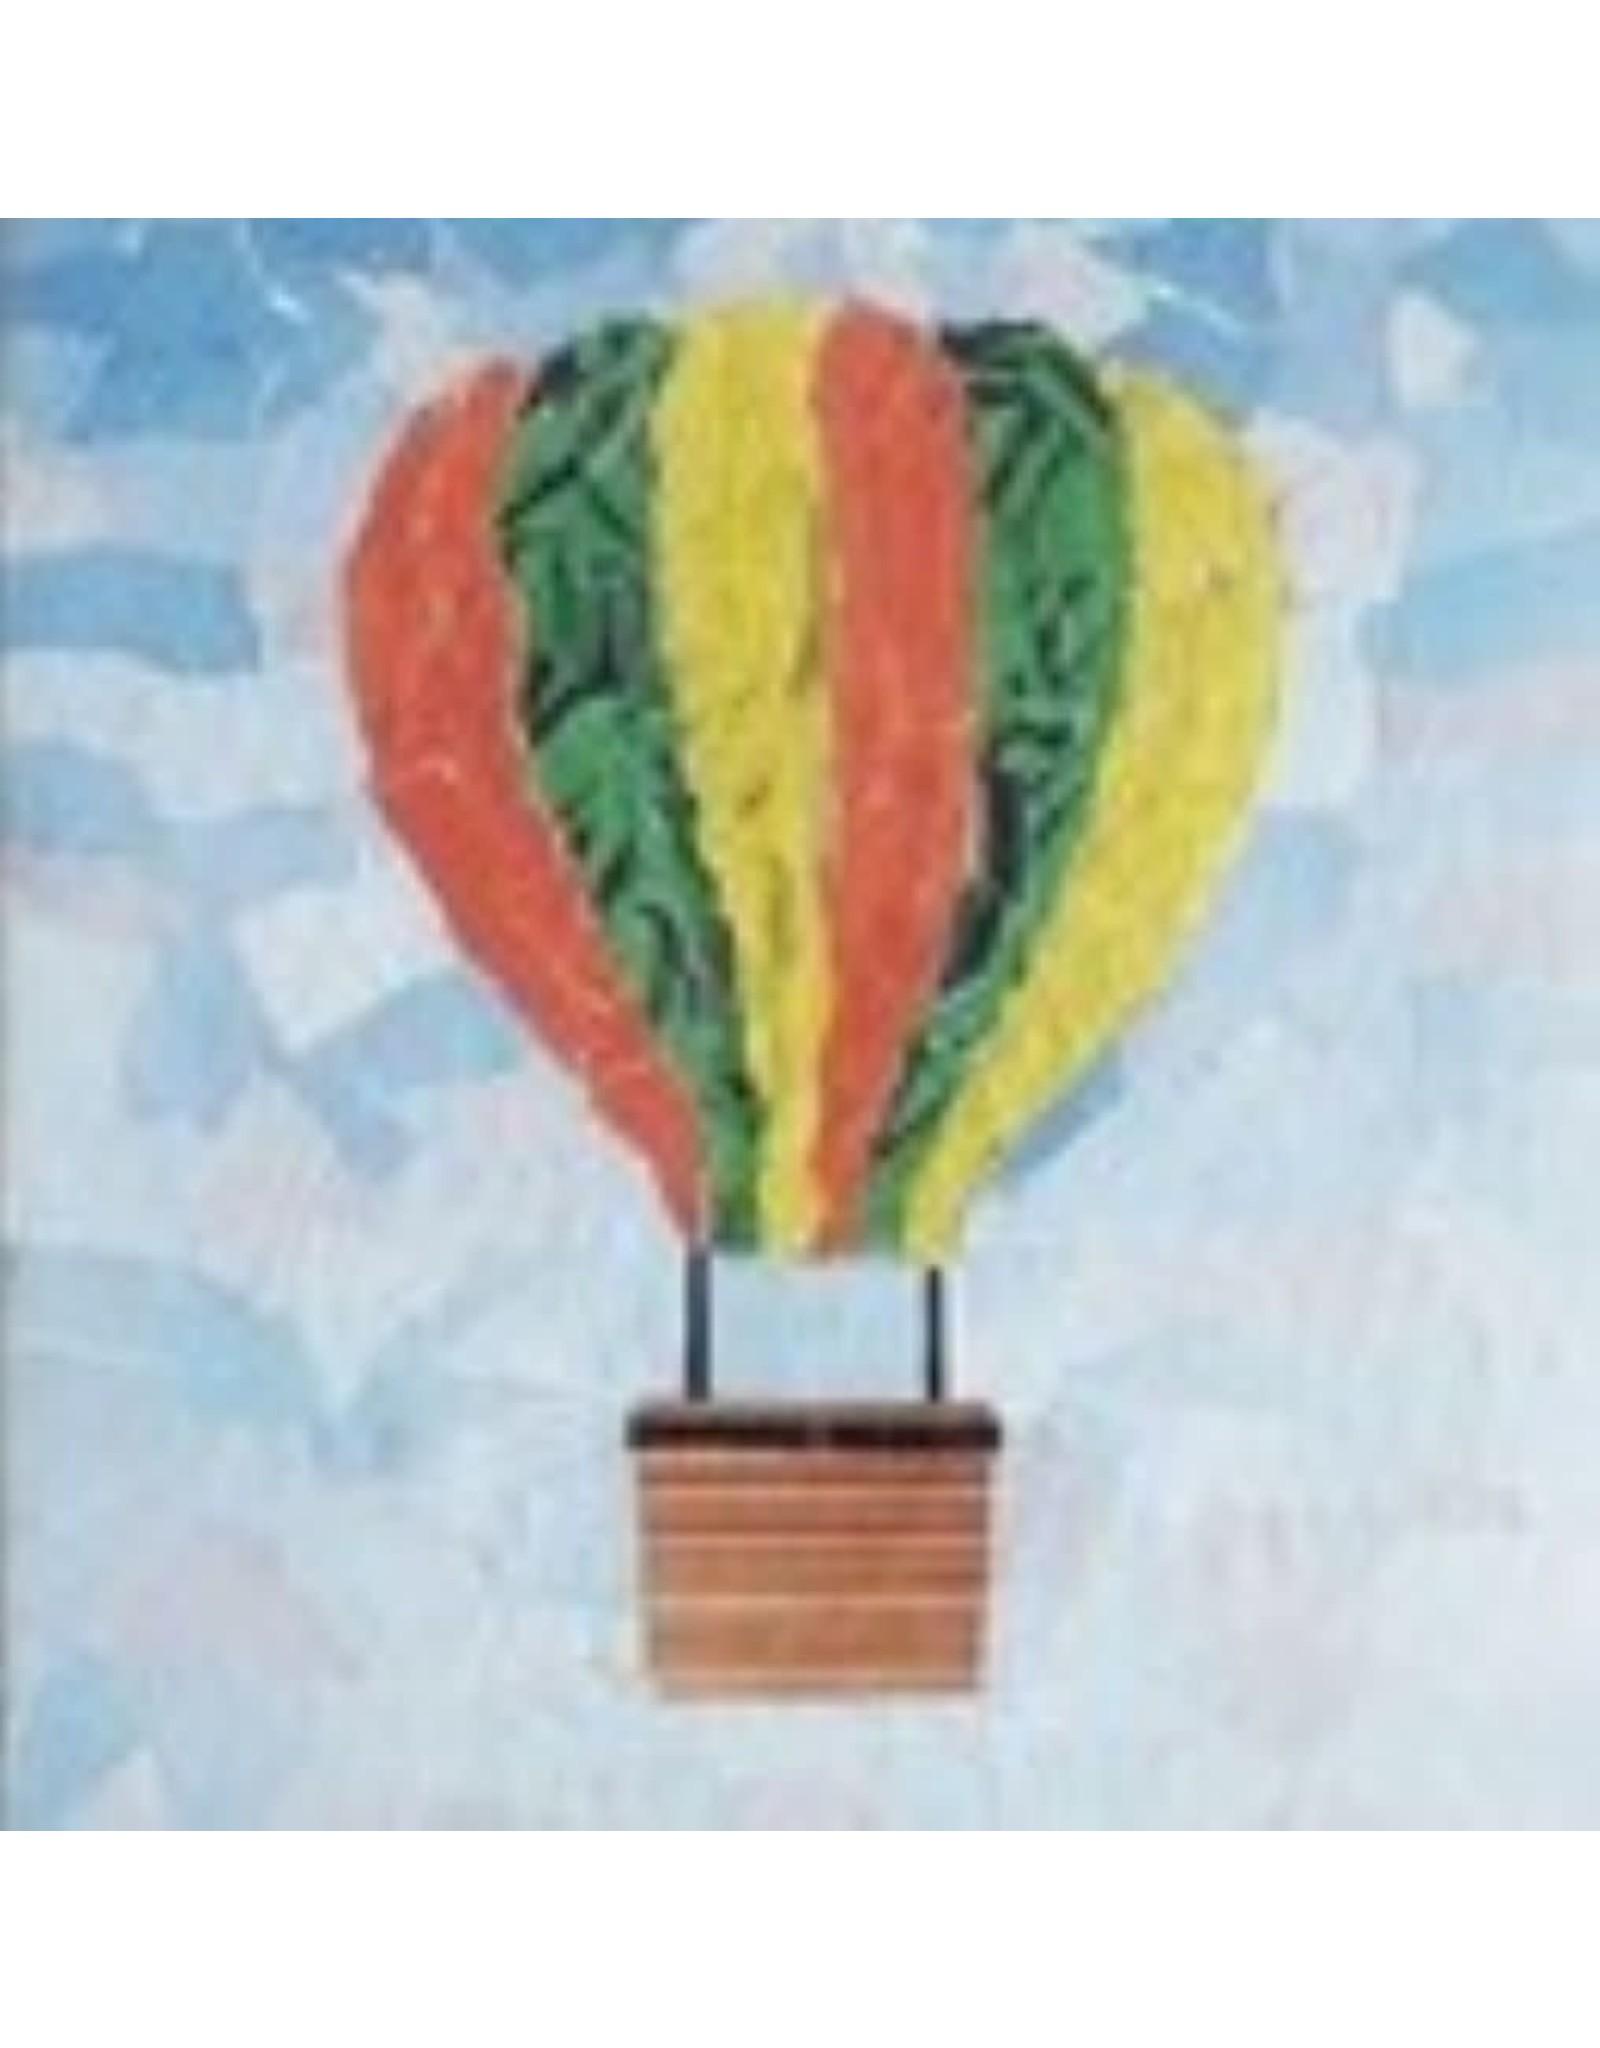 ART KIT Art Kit: Paper Collage Hot Air Balloon